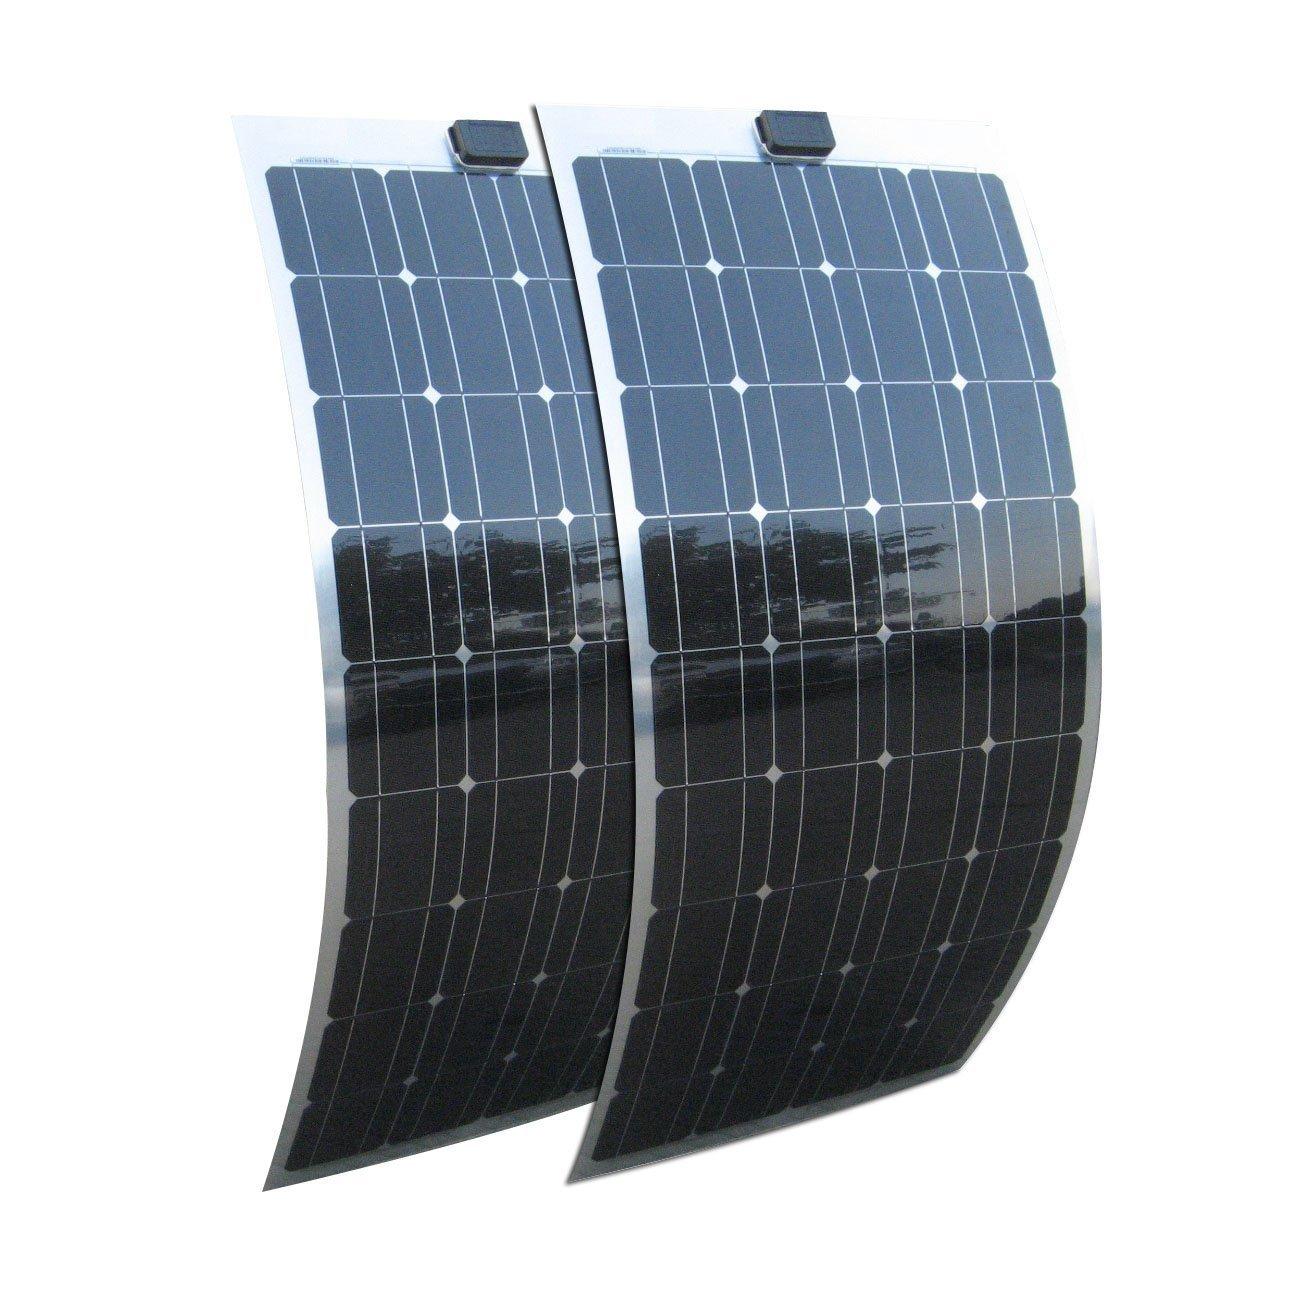 ECO-WORTHY 200W Solarzellen - 2 x 100W Solarmodul MONOKRISTALLIN Flex, Semi-flexibel, biegbar, für Solarpanel Marine-RV, Boot Batterie-Ladegerät 12 V-System